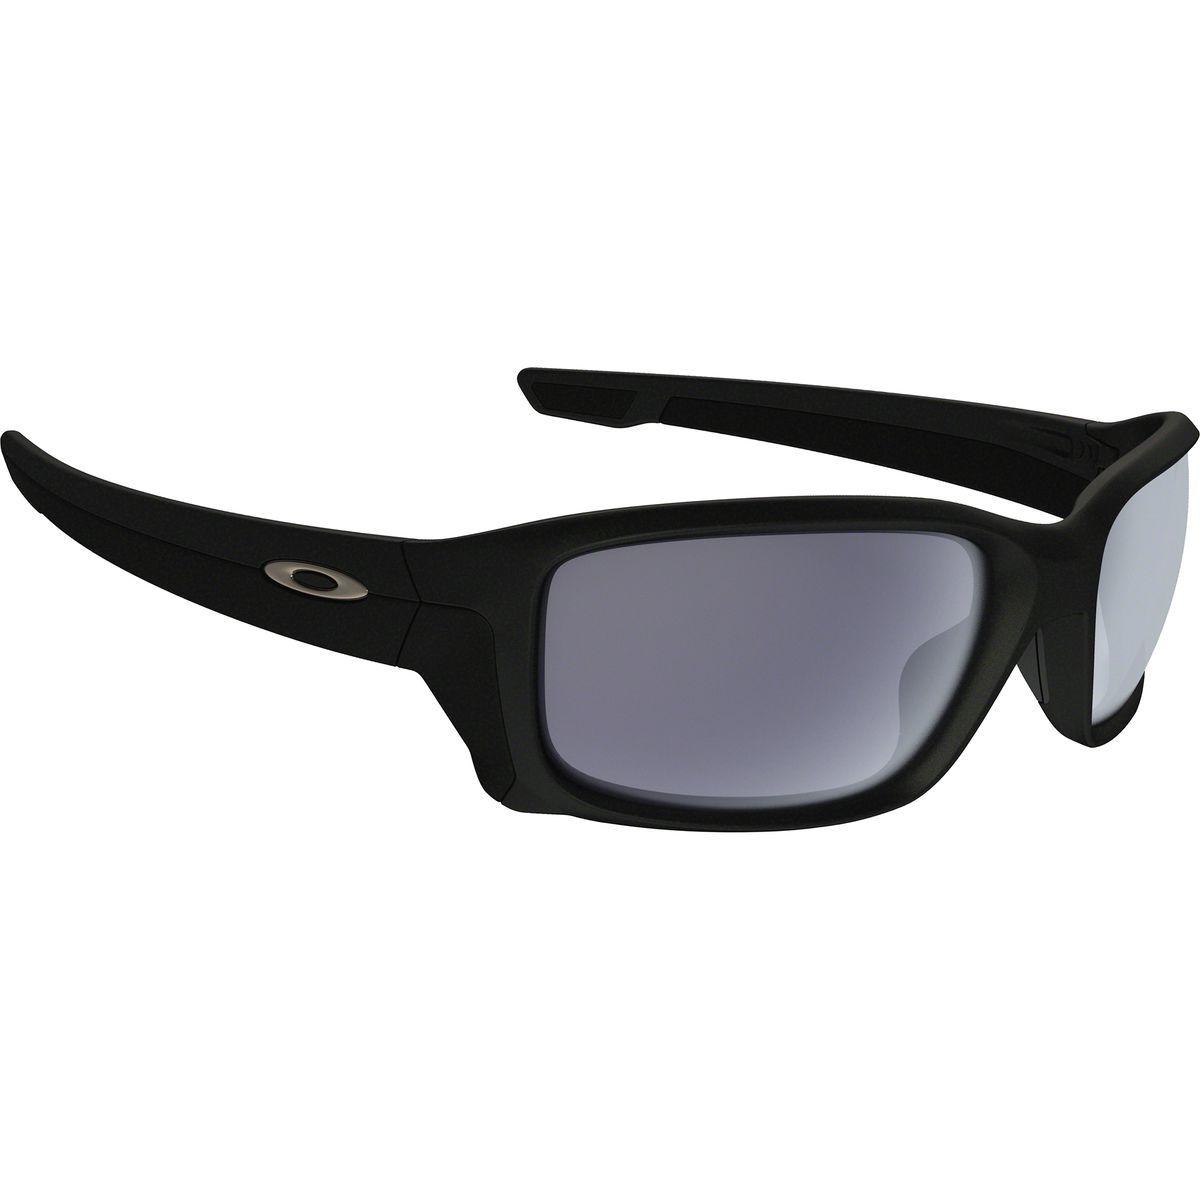 Oakley Straightlink Sunglasses - Men's